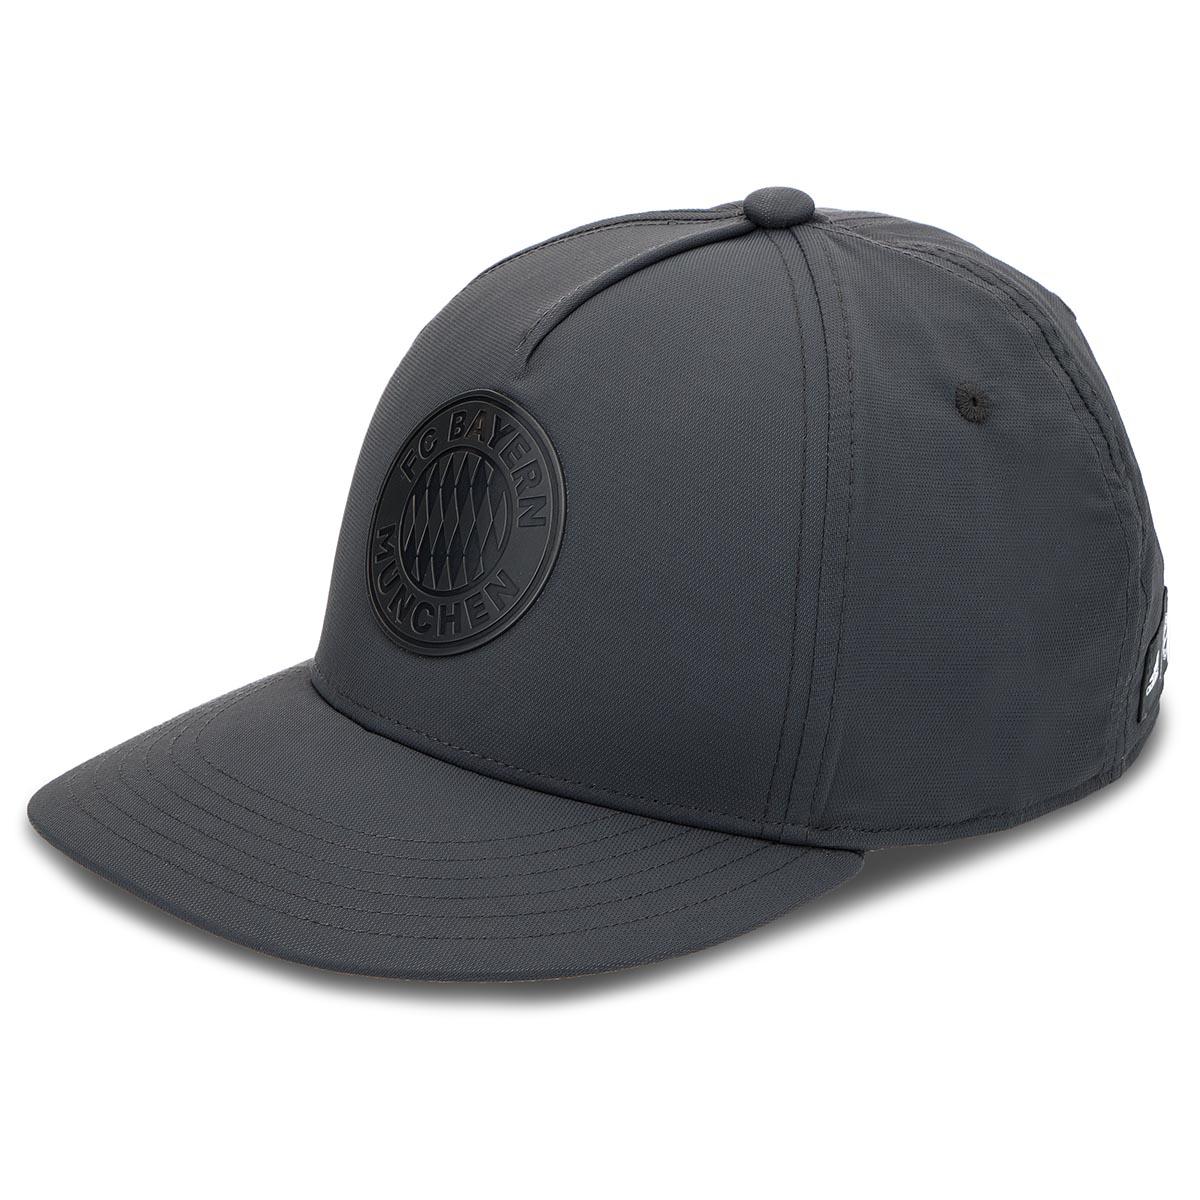 Image of Cap adidas - Fcb S16 Cap Cw DI0232 Carbon/Greone